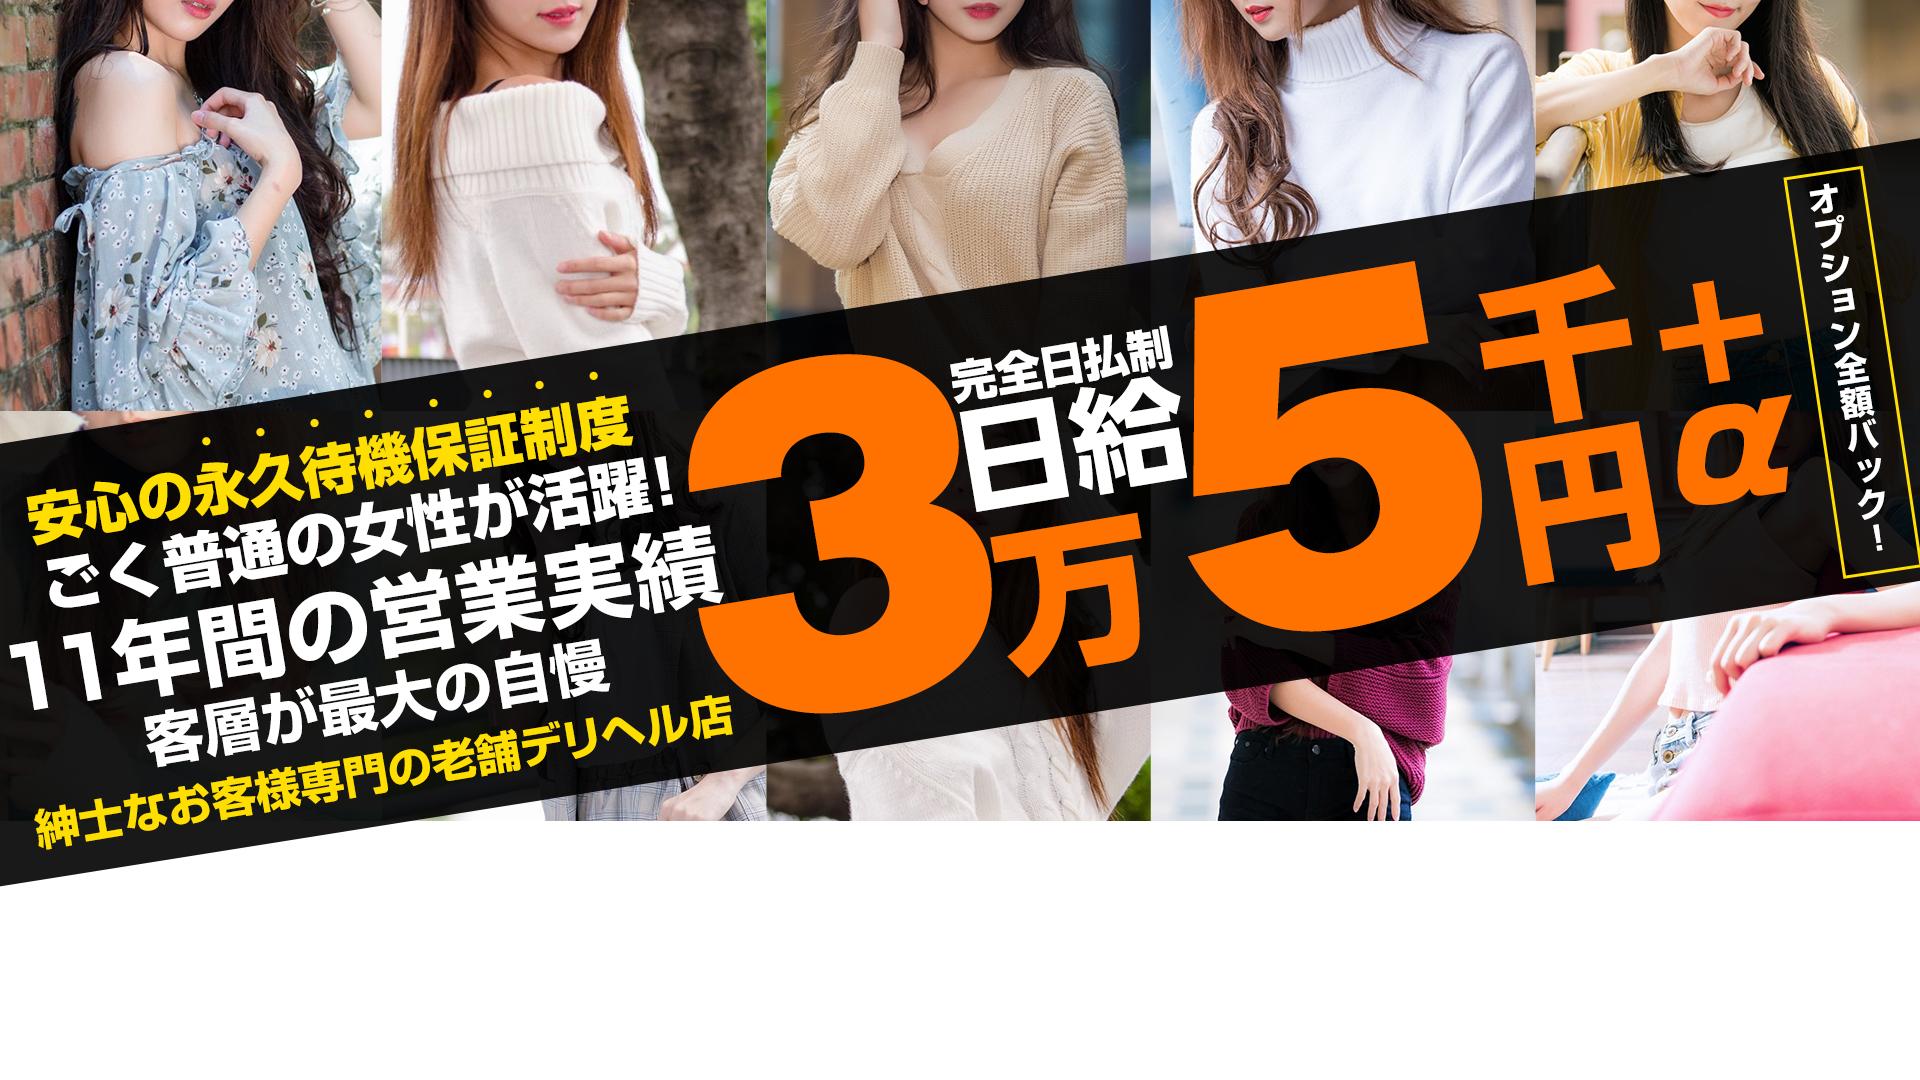 人妻華道 上田店の求人画像